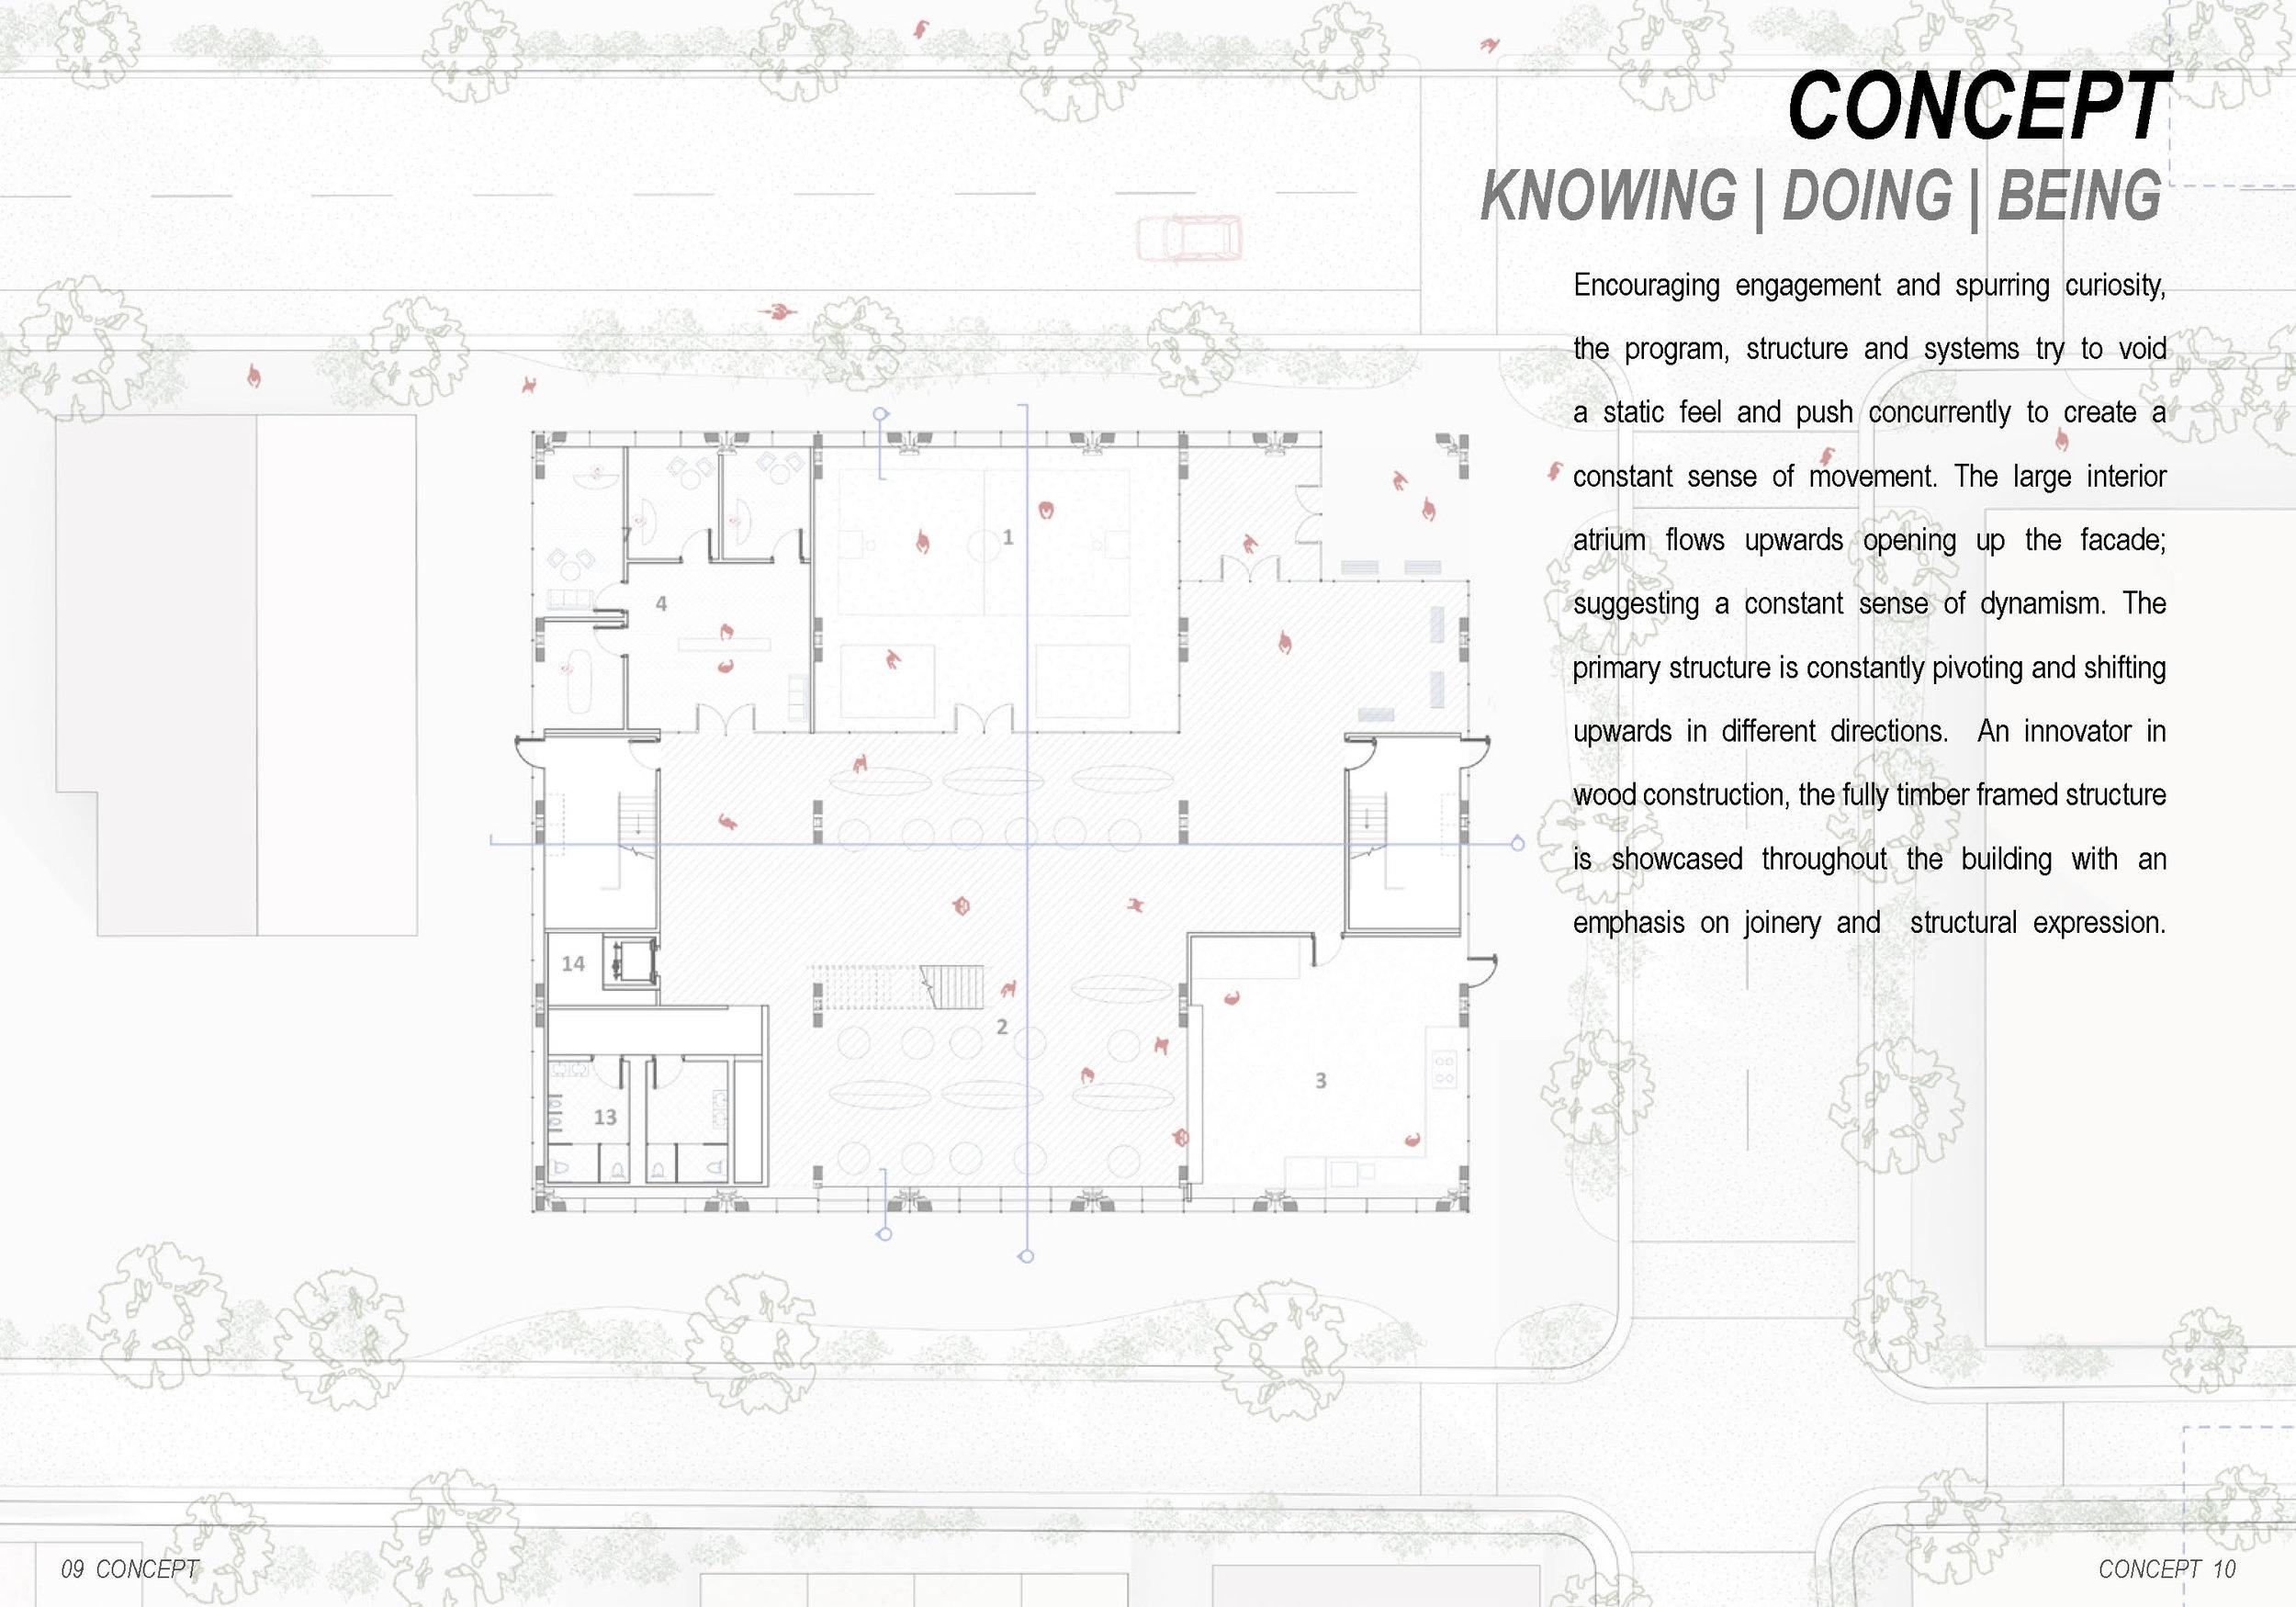 48-381_POSITION_TKHALIFA_V02_2017_05_11_SPREADS_Page_07.jpg